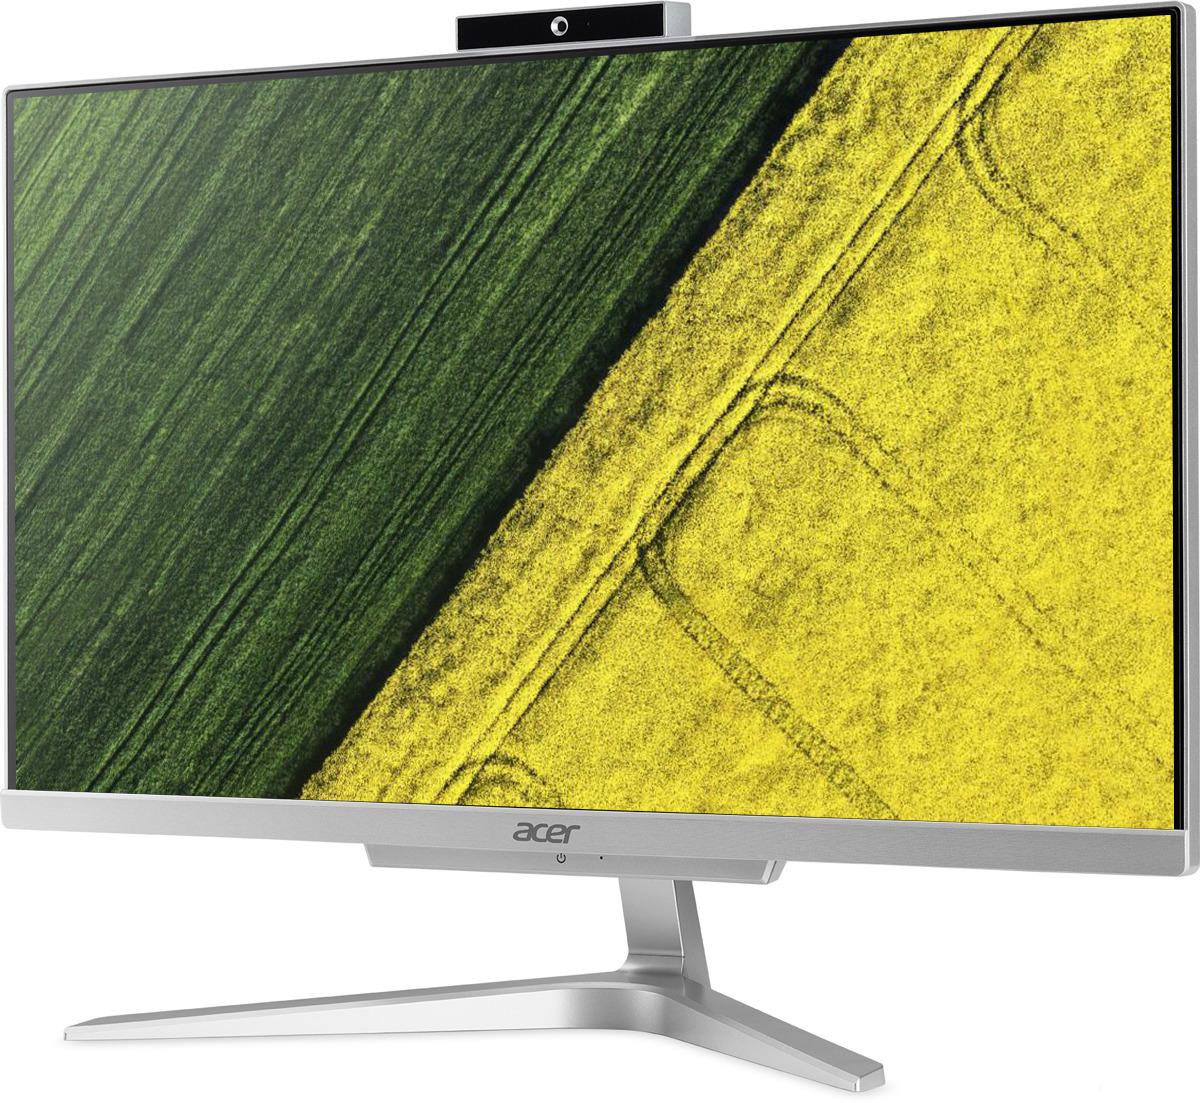 Моноблок Acer Aspire C24-865, DQ.BBTER.006, 23.8